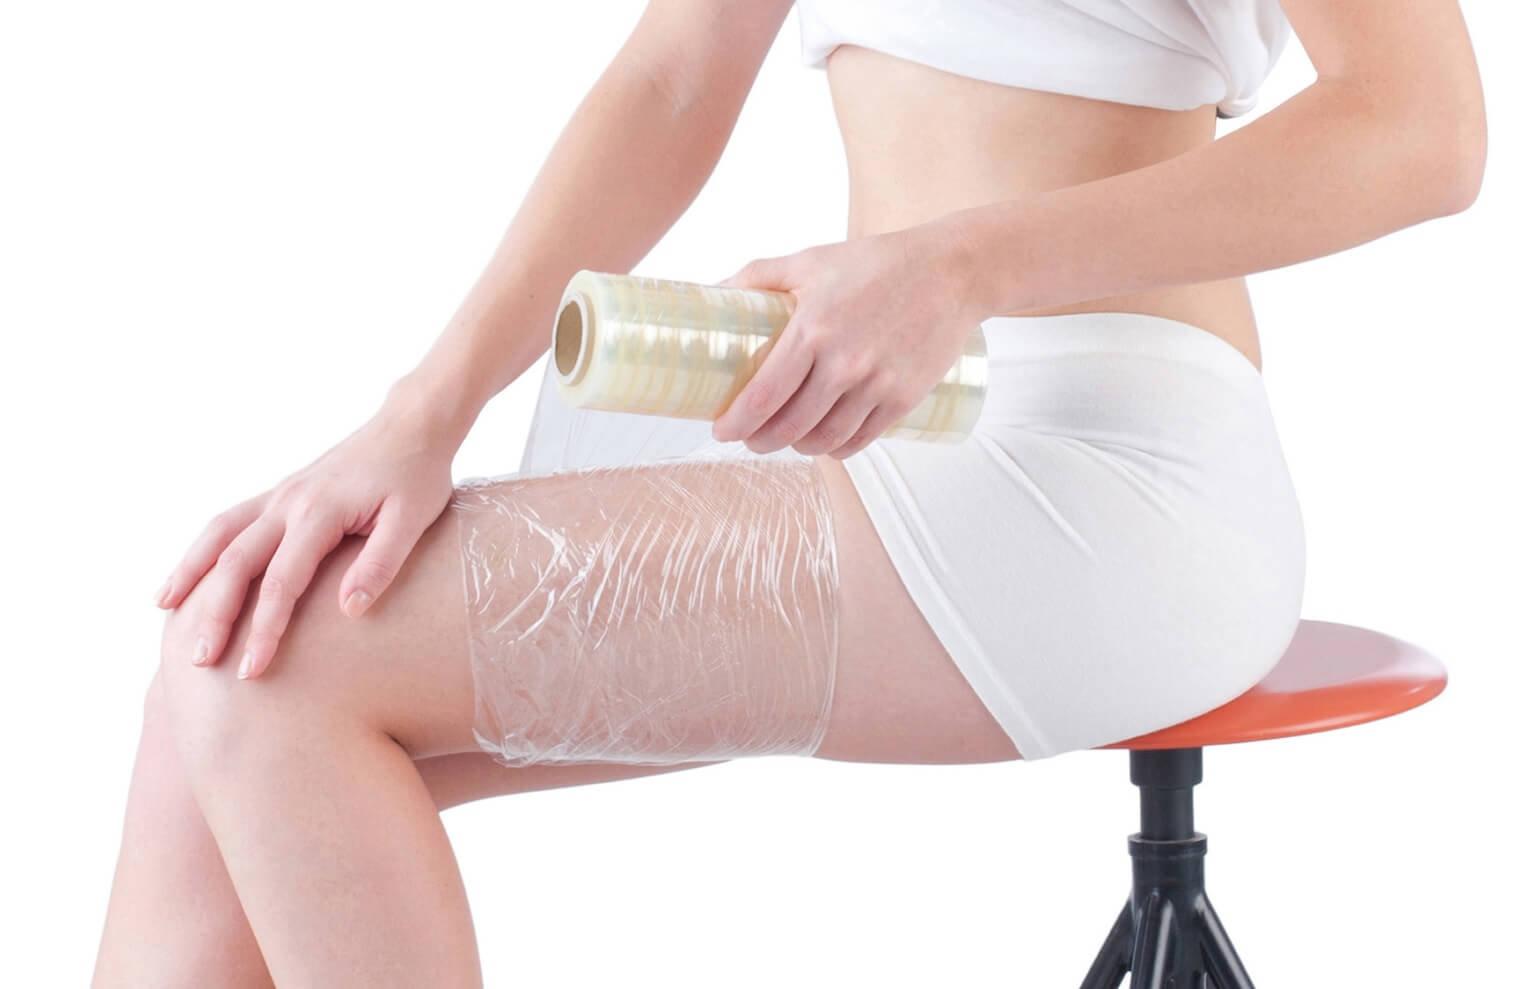 Add On Thigh Wrap To Sauna Treatment